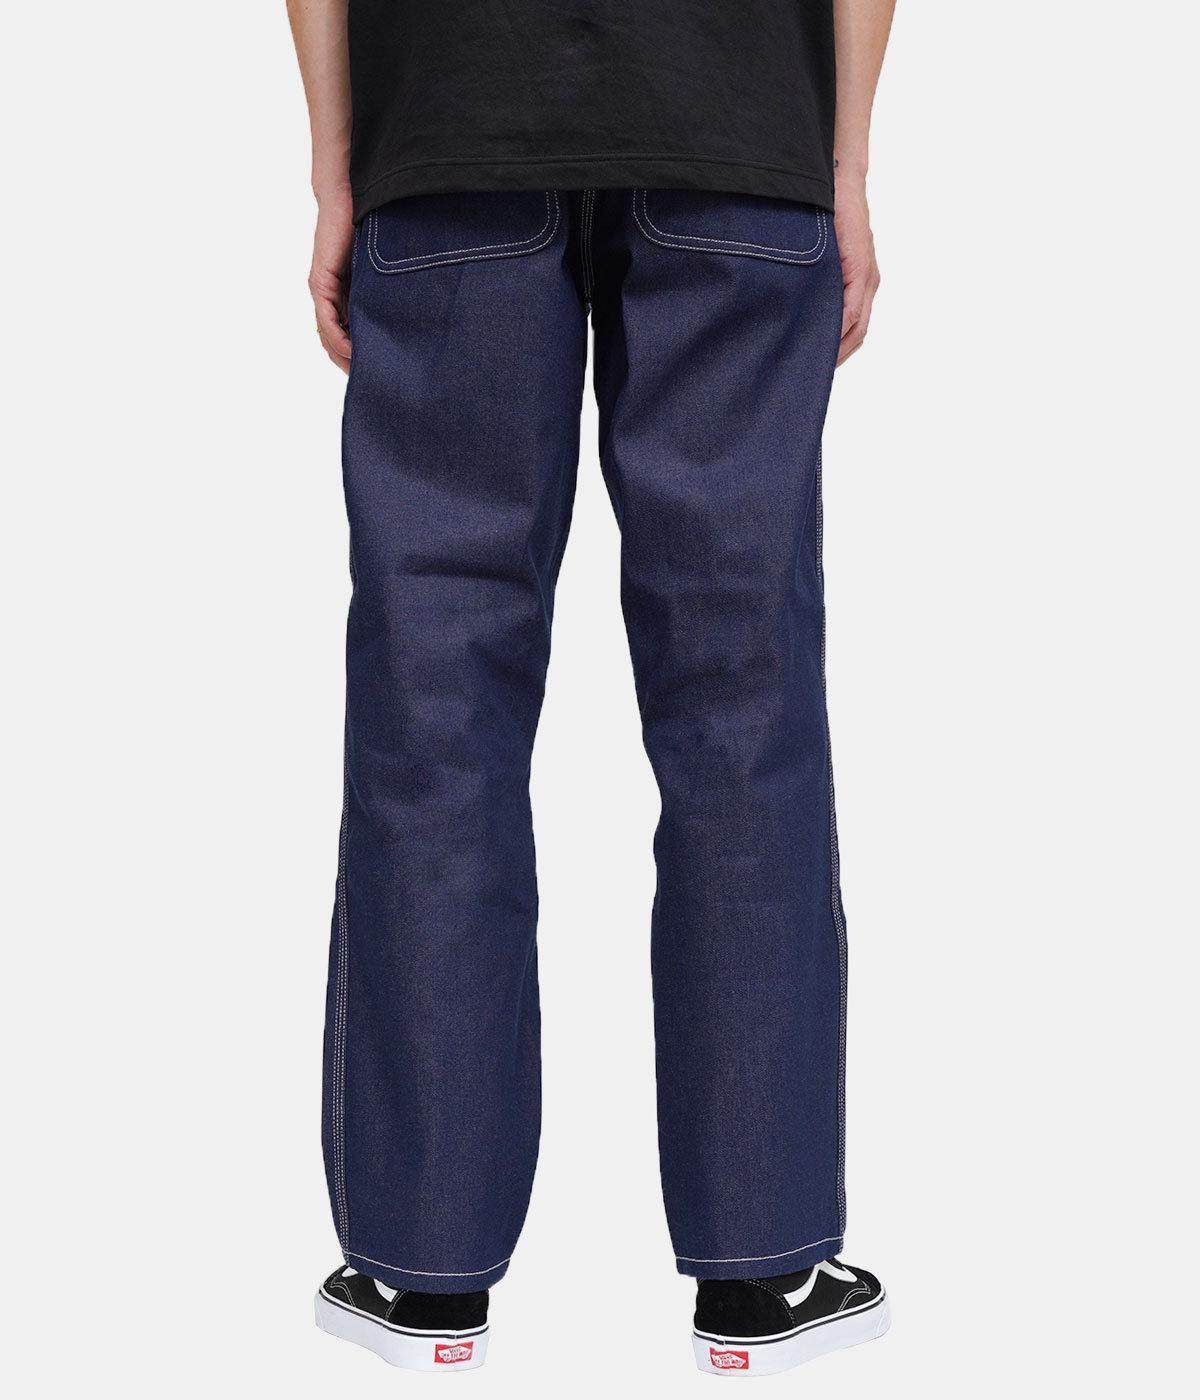 SIMPLE PANT -BLUE RIGID-